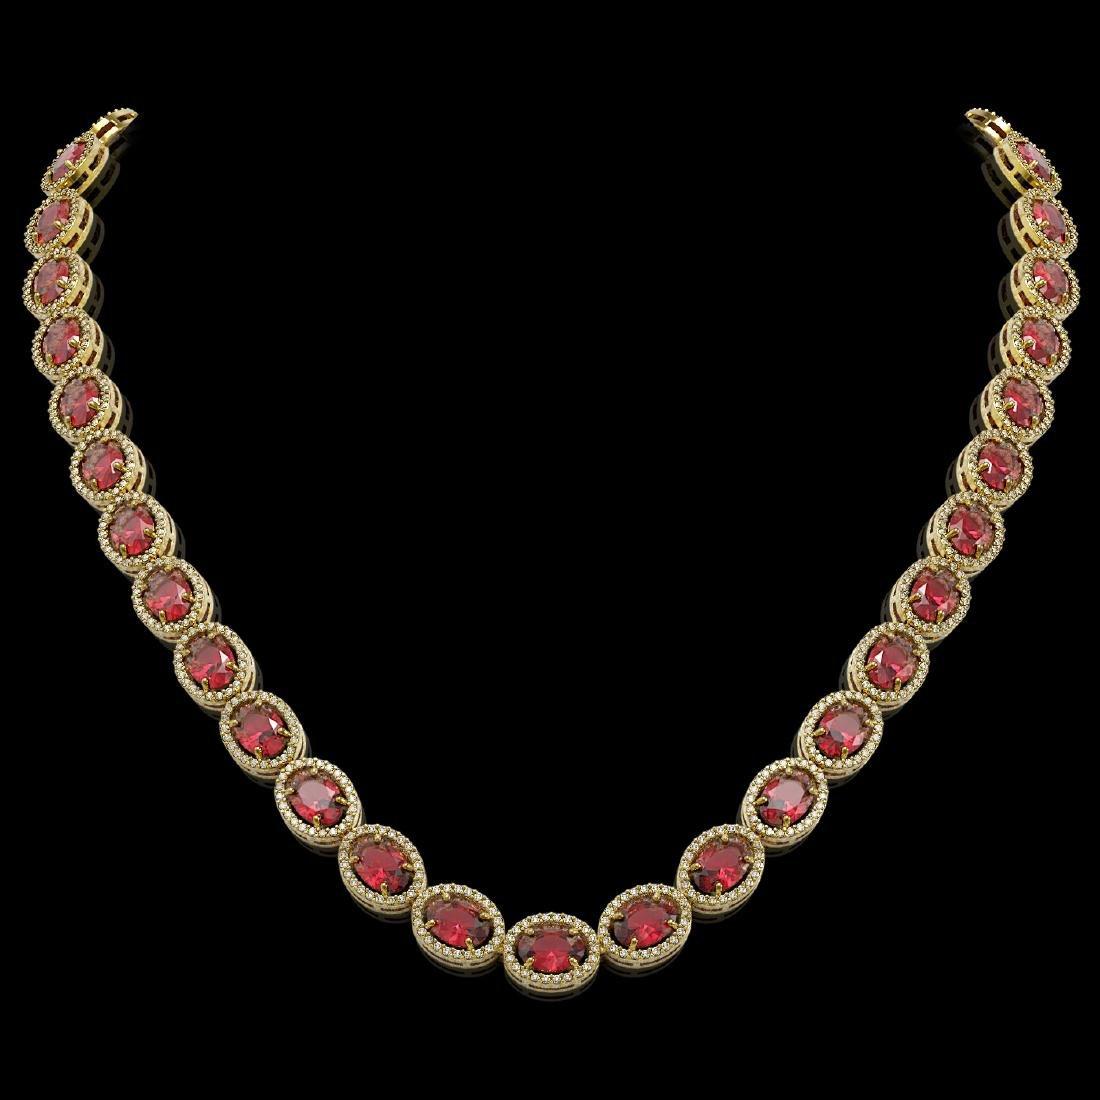 49.46 CTW Tourmaline & Diamond Halo Necklace 10K Yellow